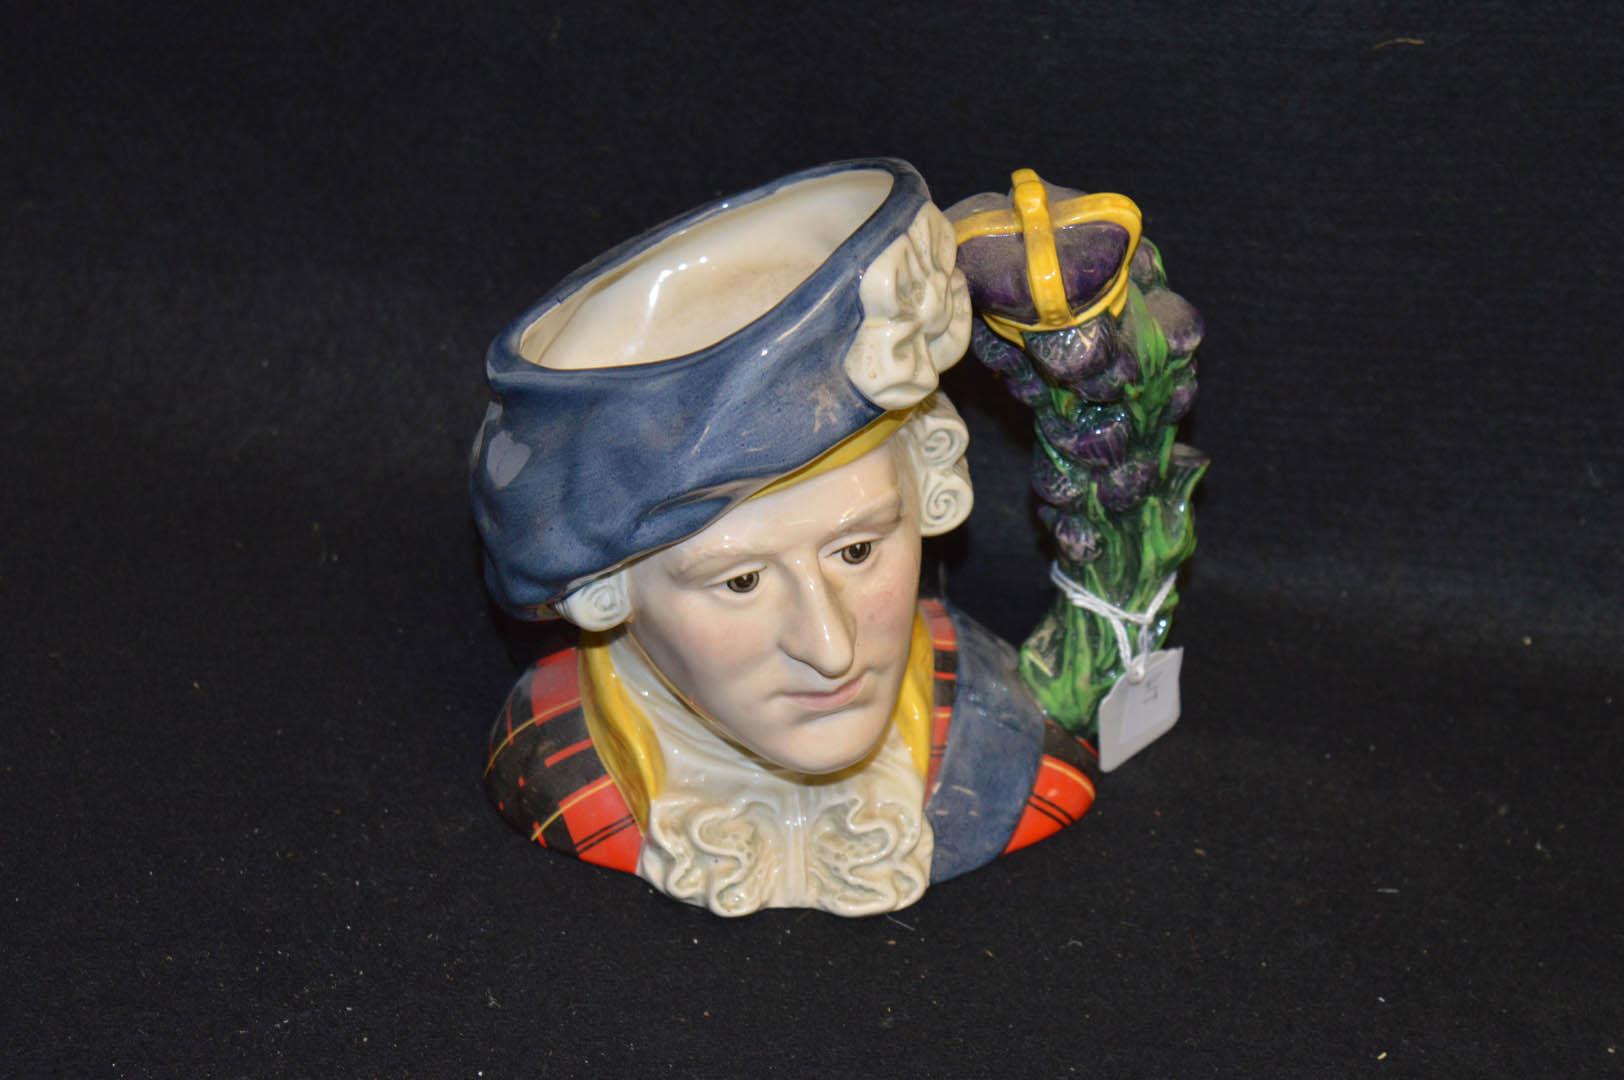 Lot 1 - A Royal Doulton Jug 'Bonnie Prince Charlie'